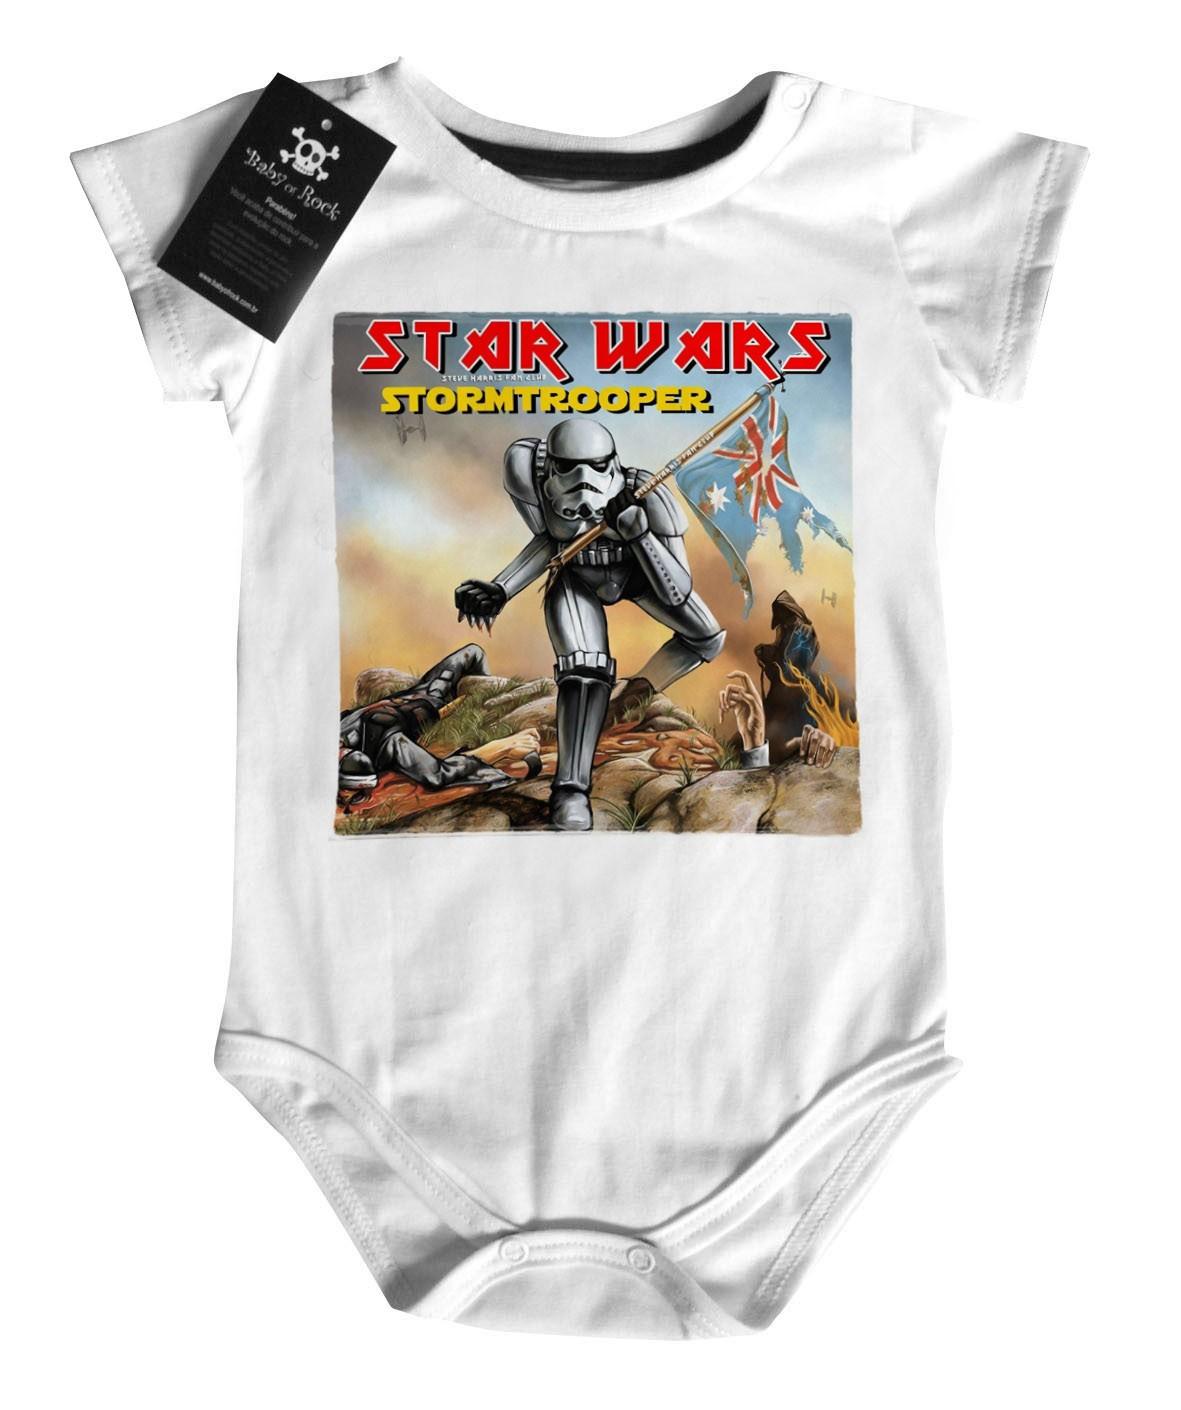 Body Bebê Star Wars / Iron Maiden - White  - Baby Monster - Body Bebe